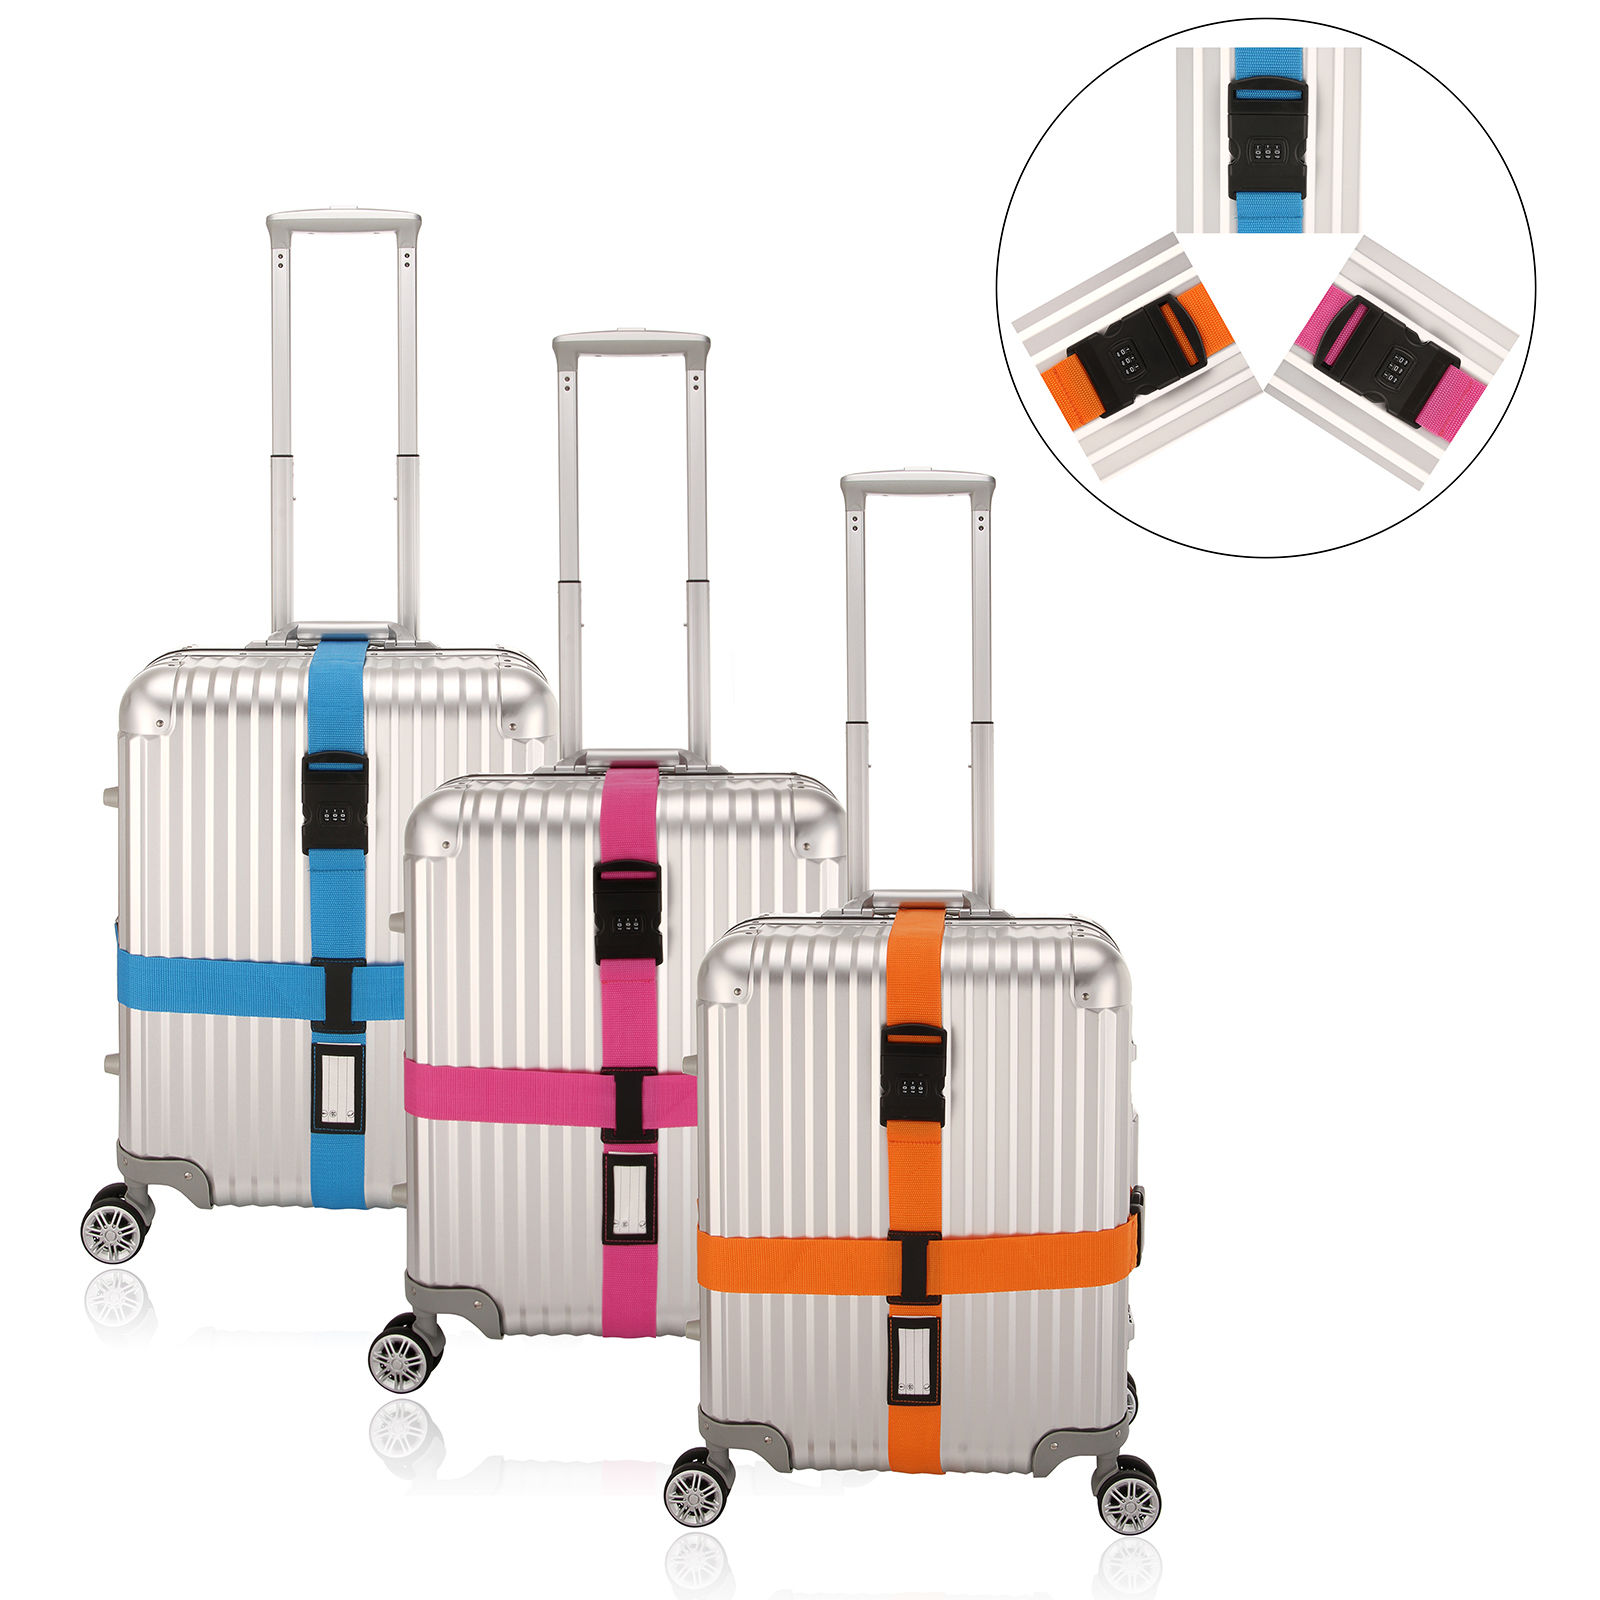 Adjustable Luggage Suitcase Cross Strap Belt With Digital Code Lock + Tag